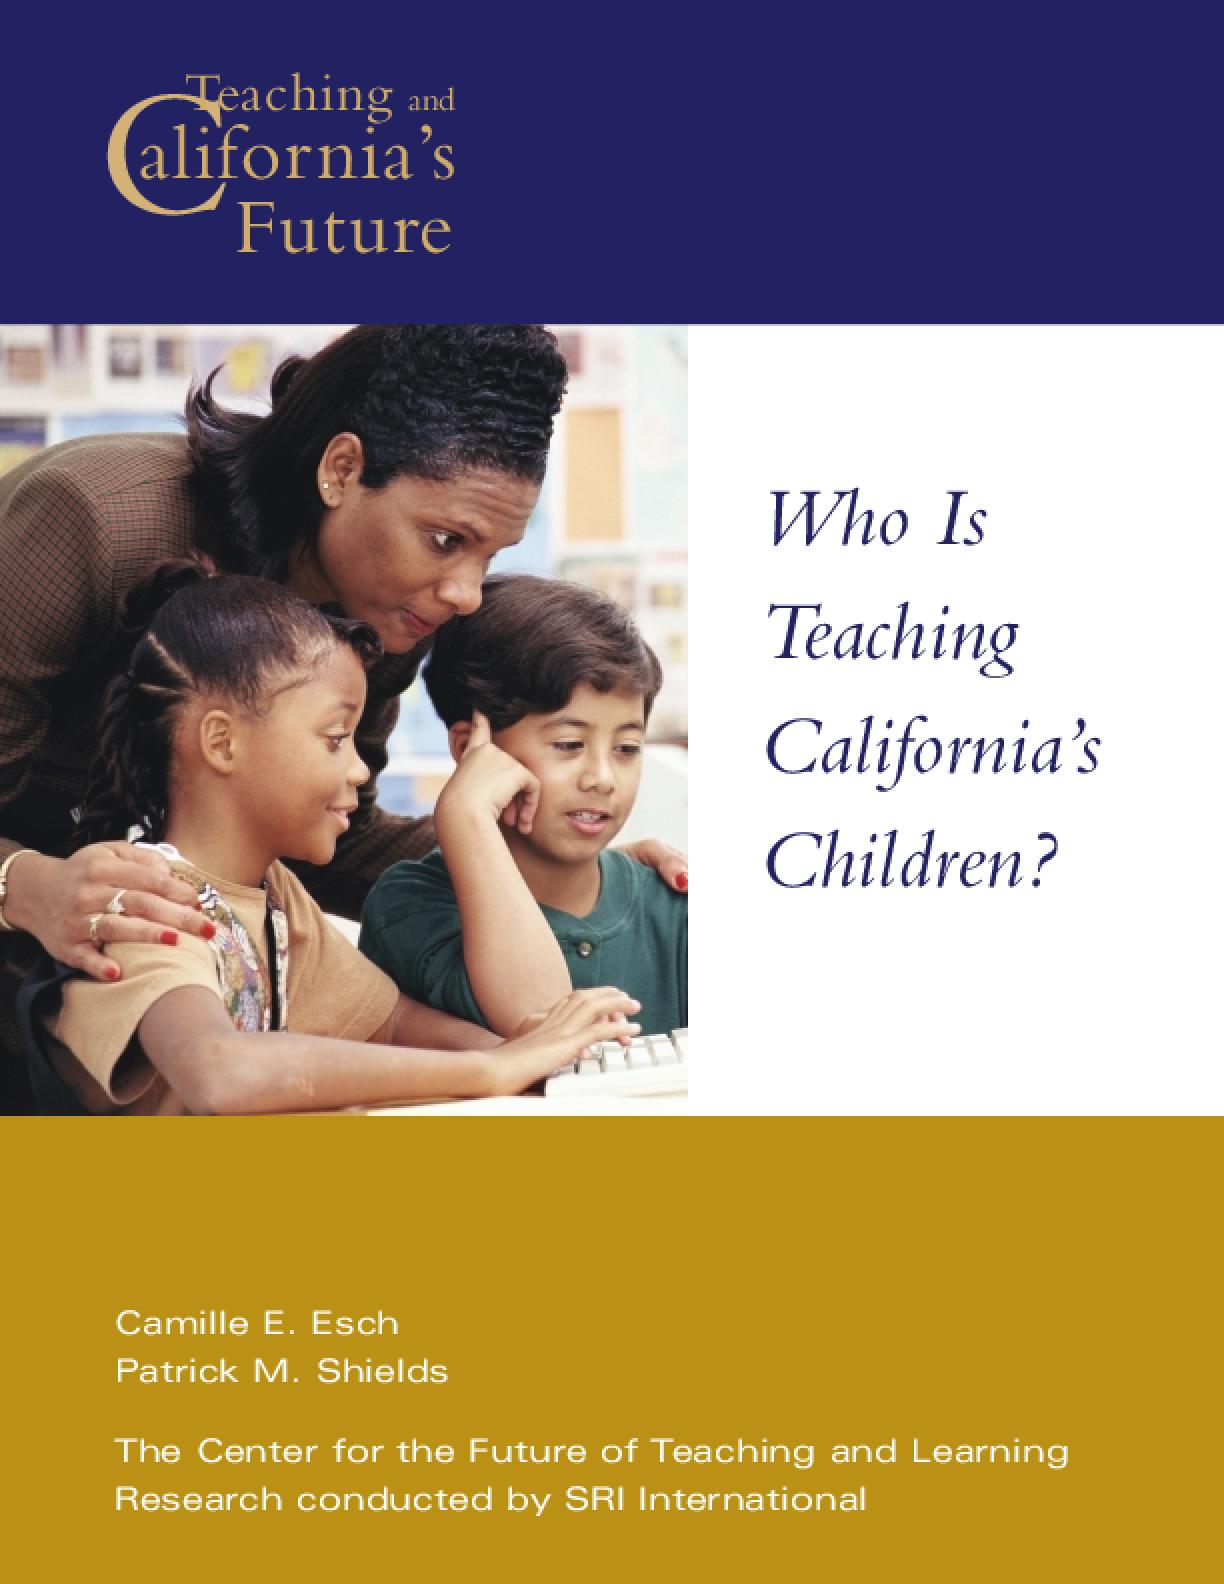 Who Is Teaching California's Children?